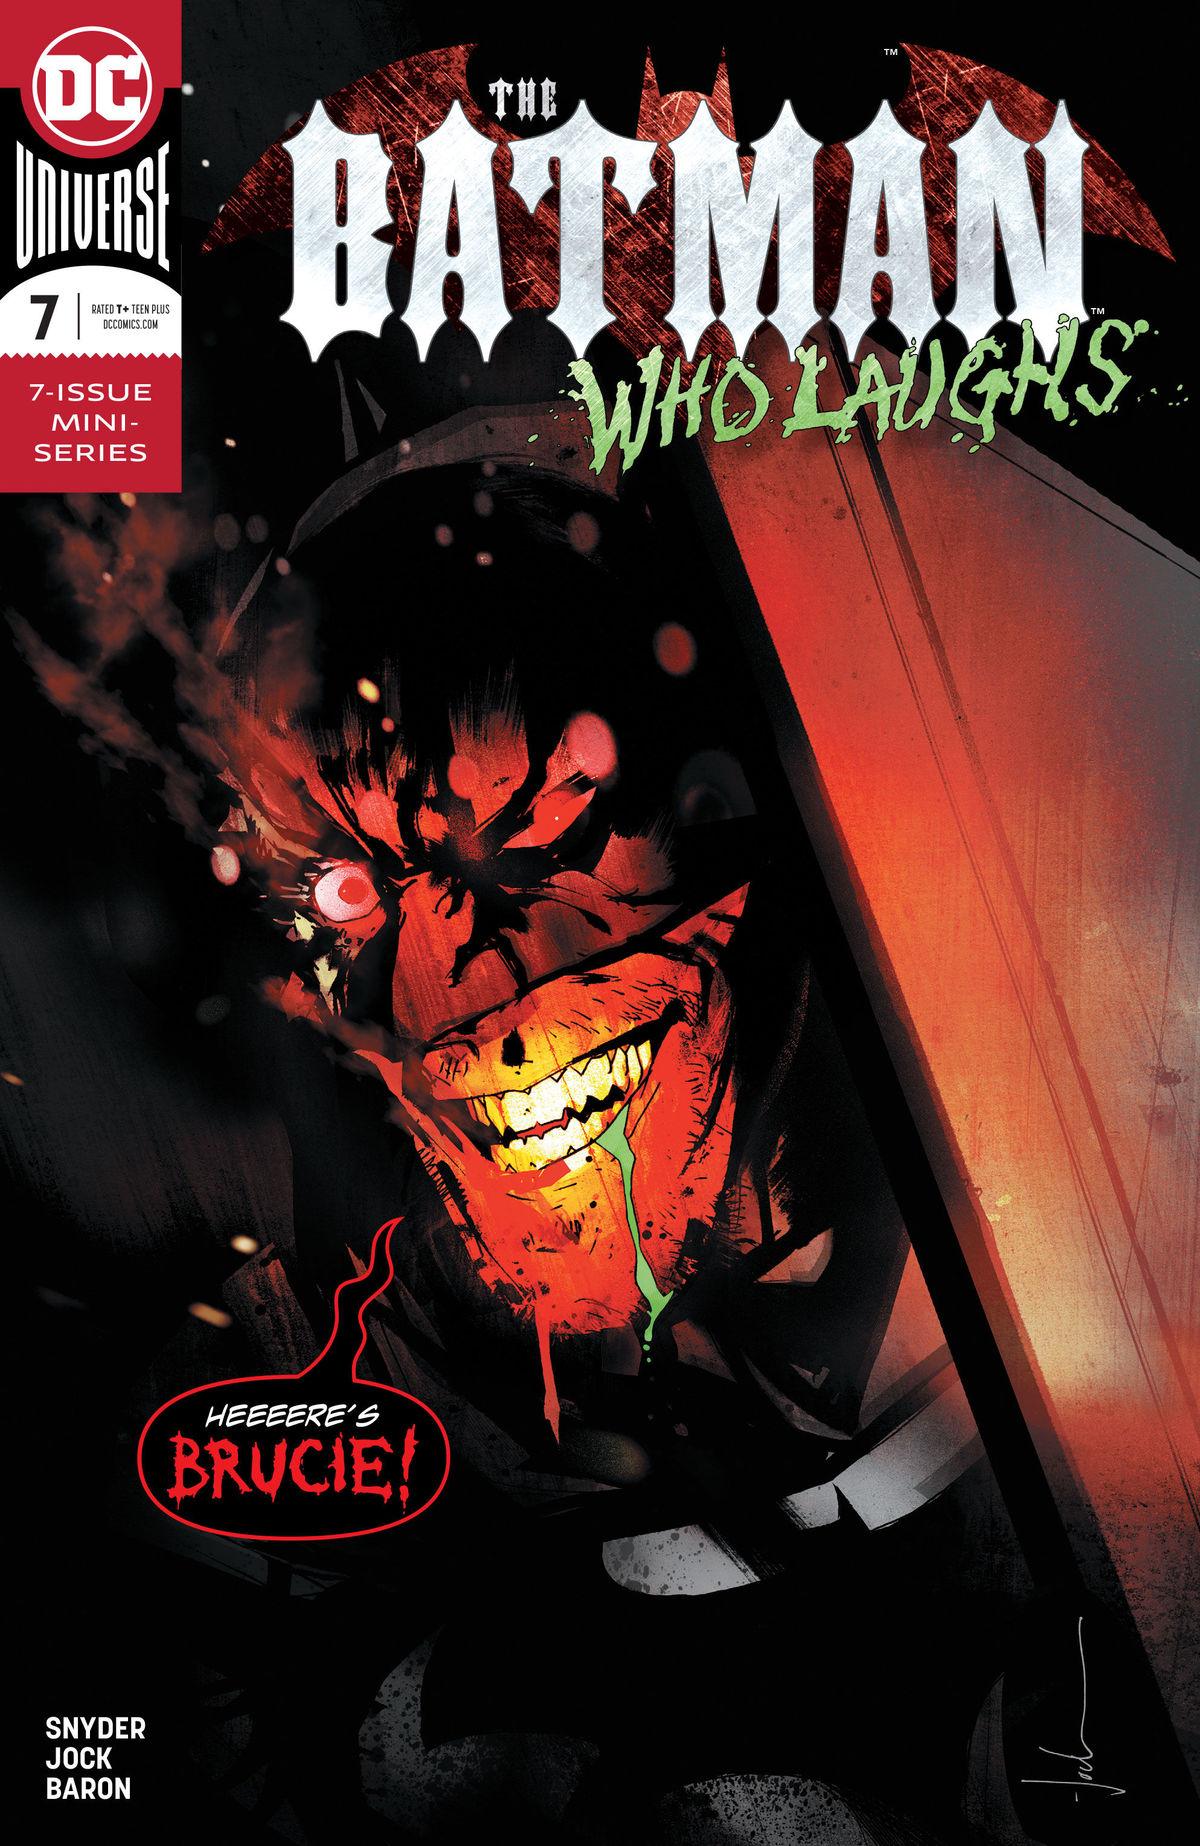 [Image: THE-BATMAN-WHO-LAUGHS-Cv7.jpg]